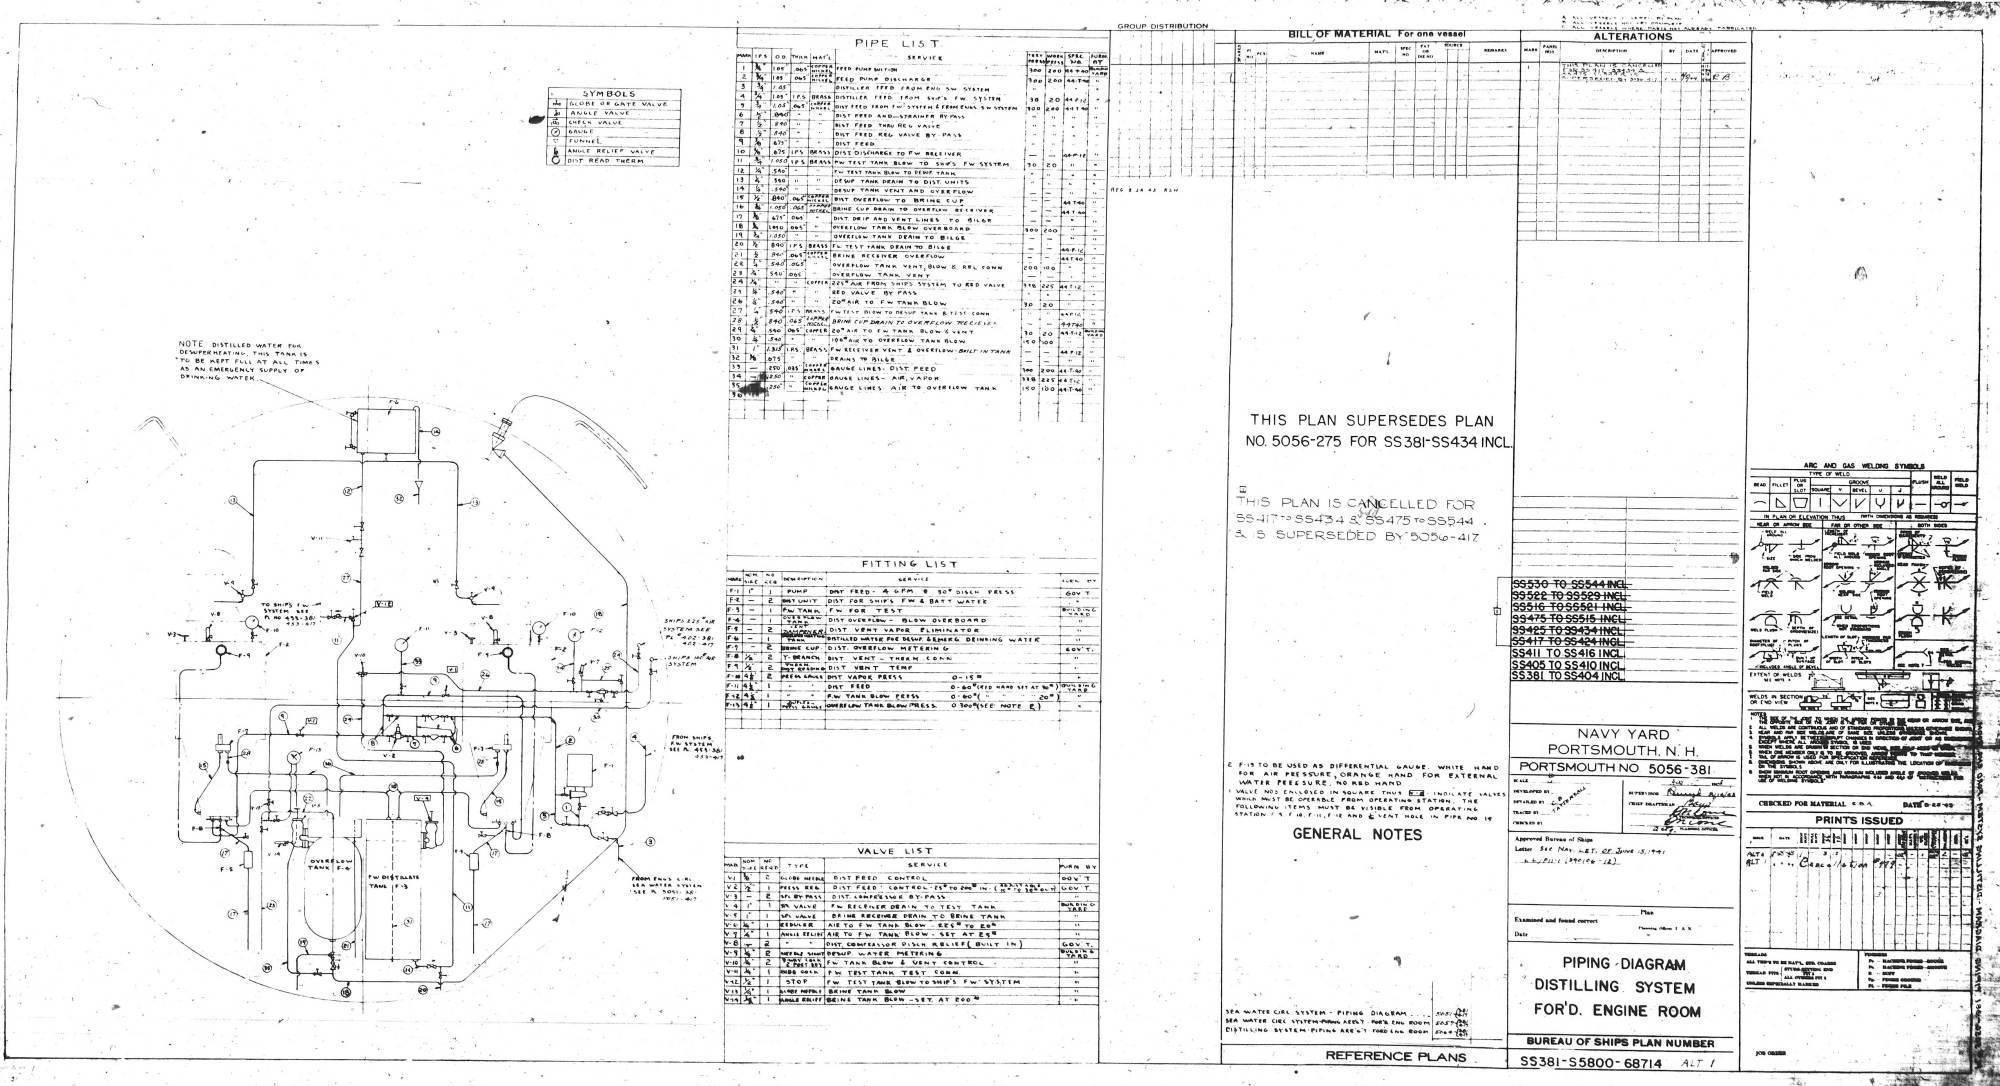 hight resolution of distilling system piping diagram forward engine room ss381 s5800